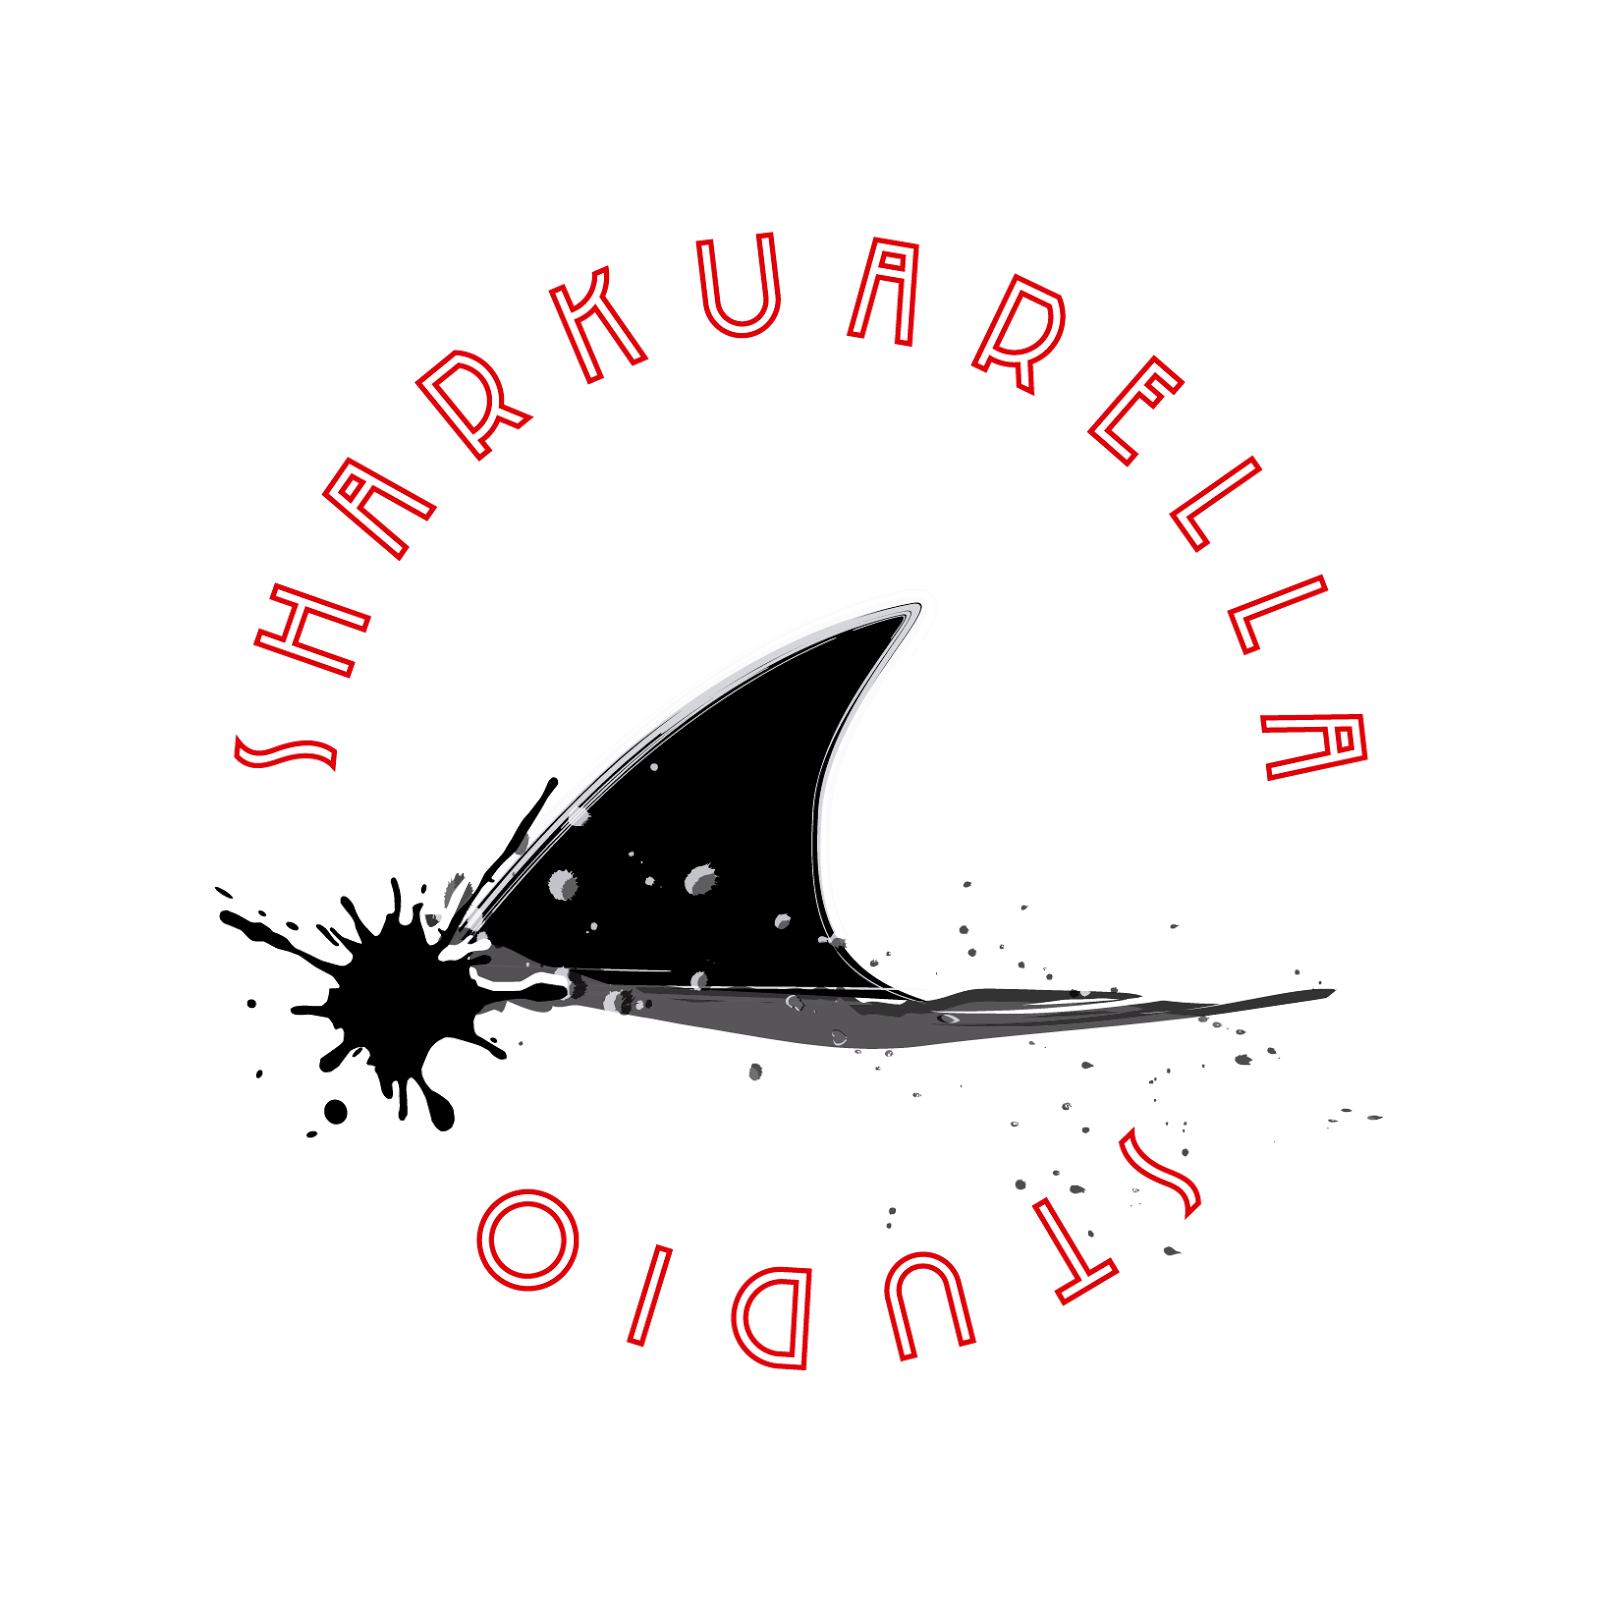 Sharkuarella Logo